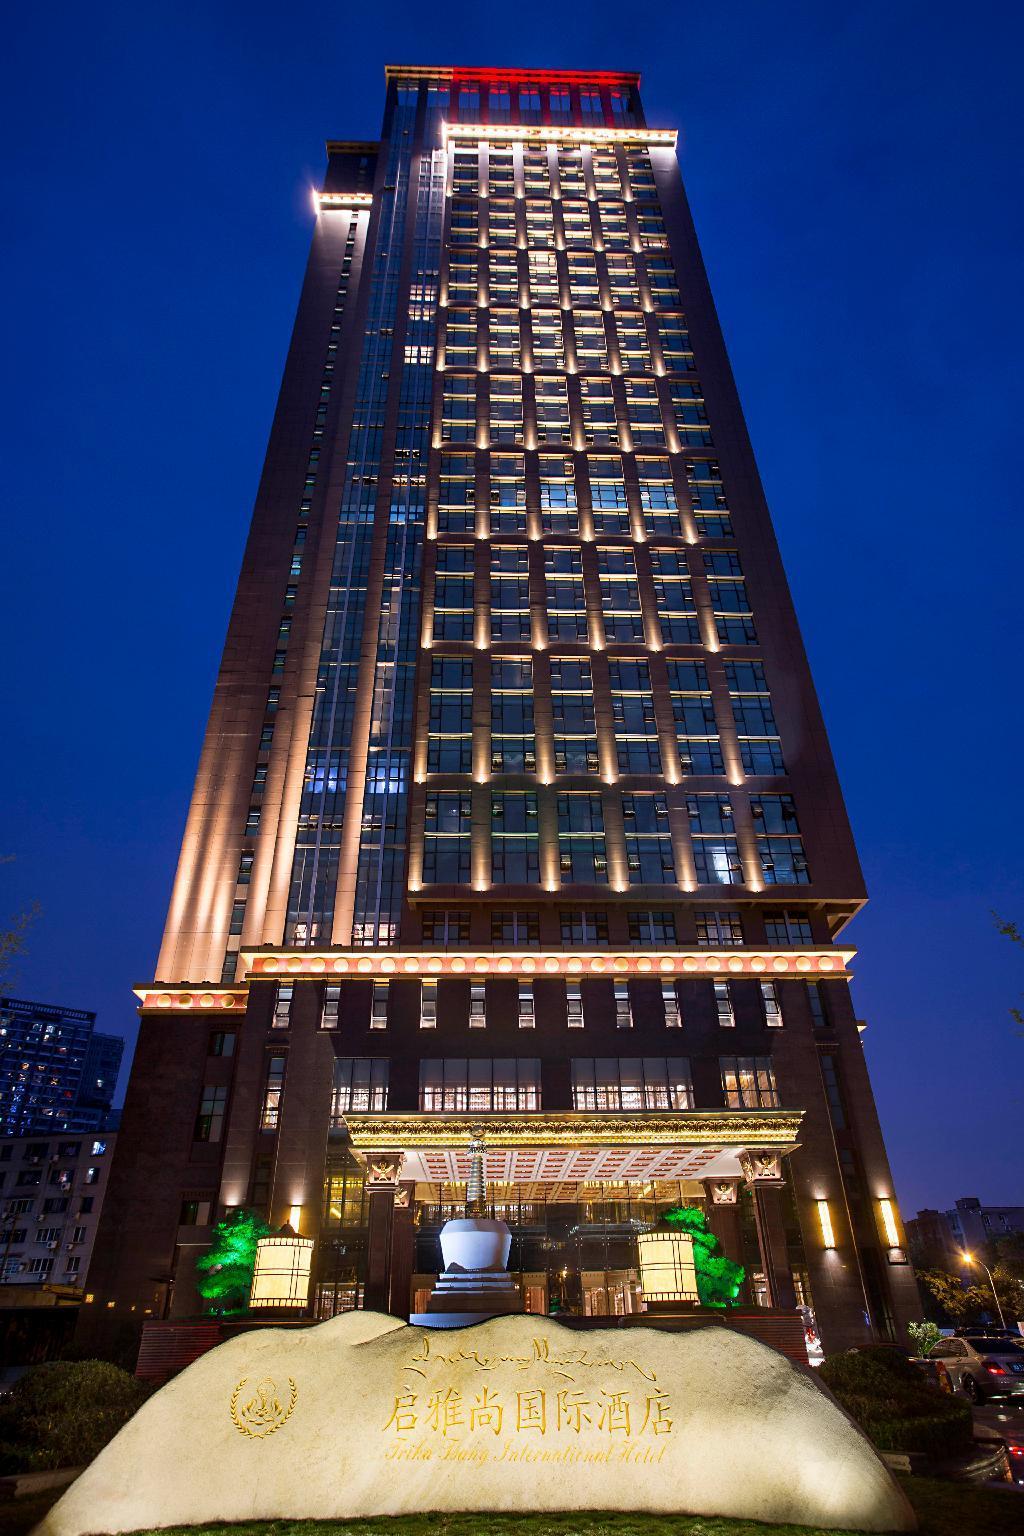 CHENGDU Trika Tsang International Hotel